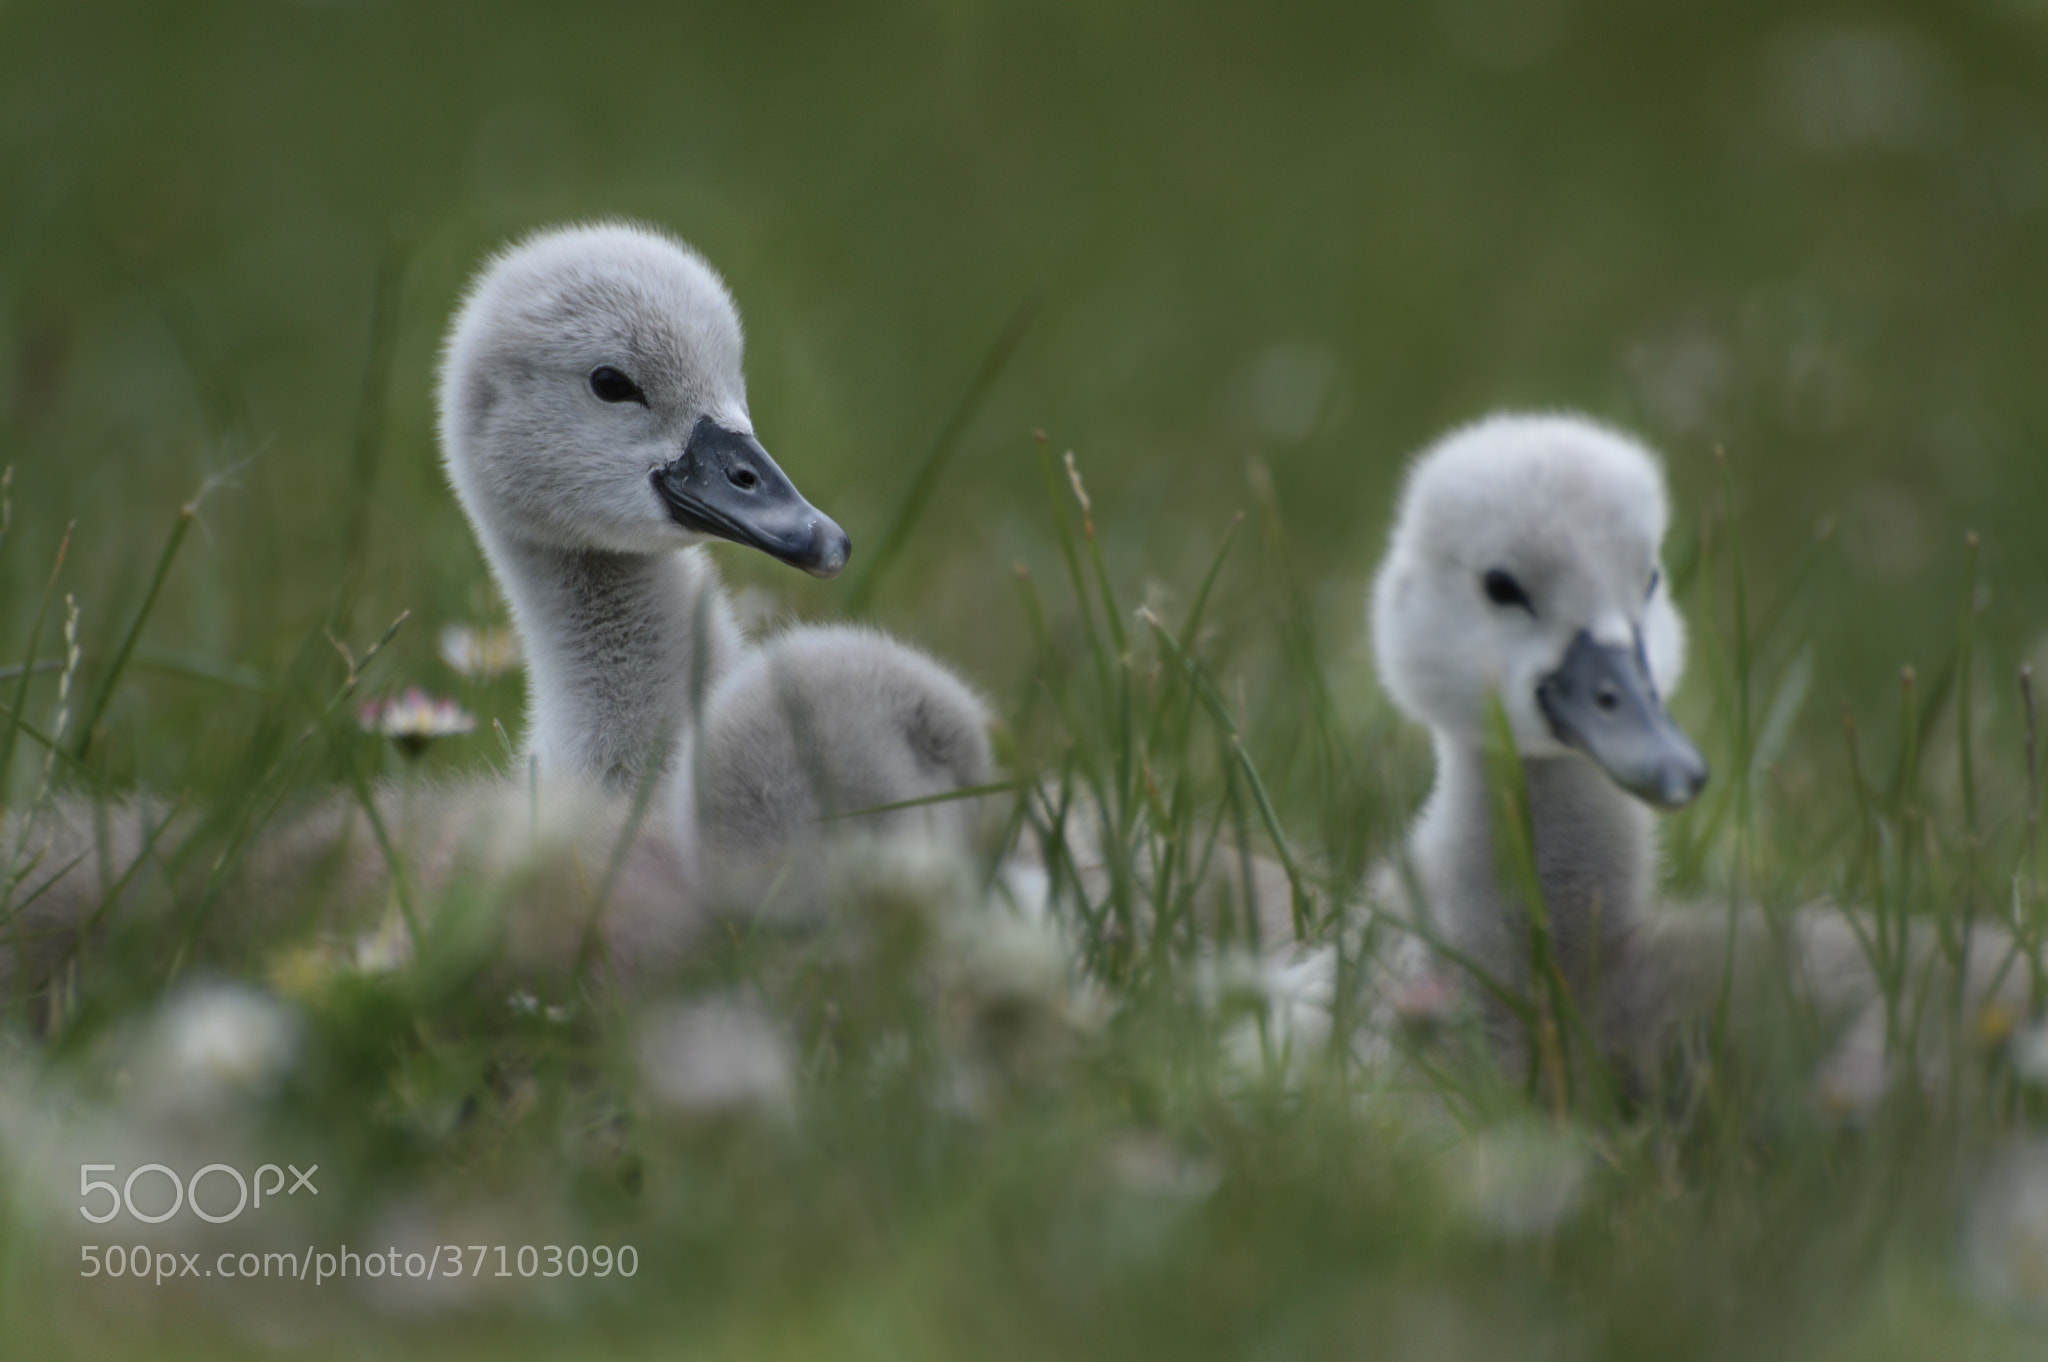 Photograph Baby Swan by Stojak Nikola on 500px